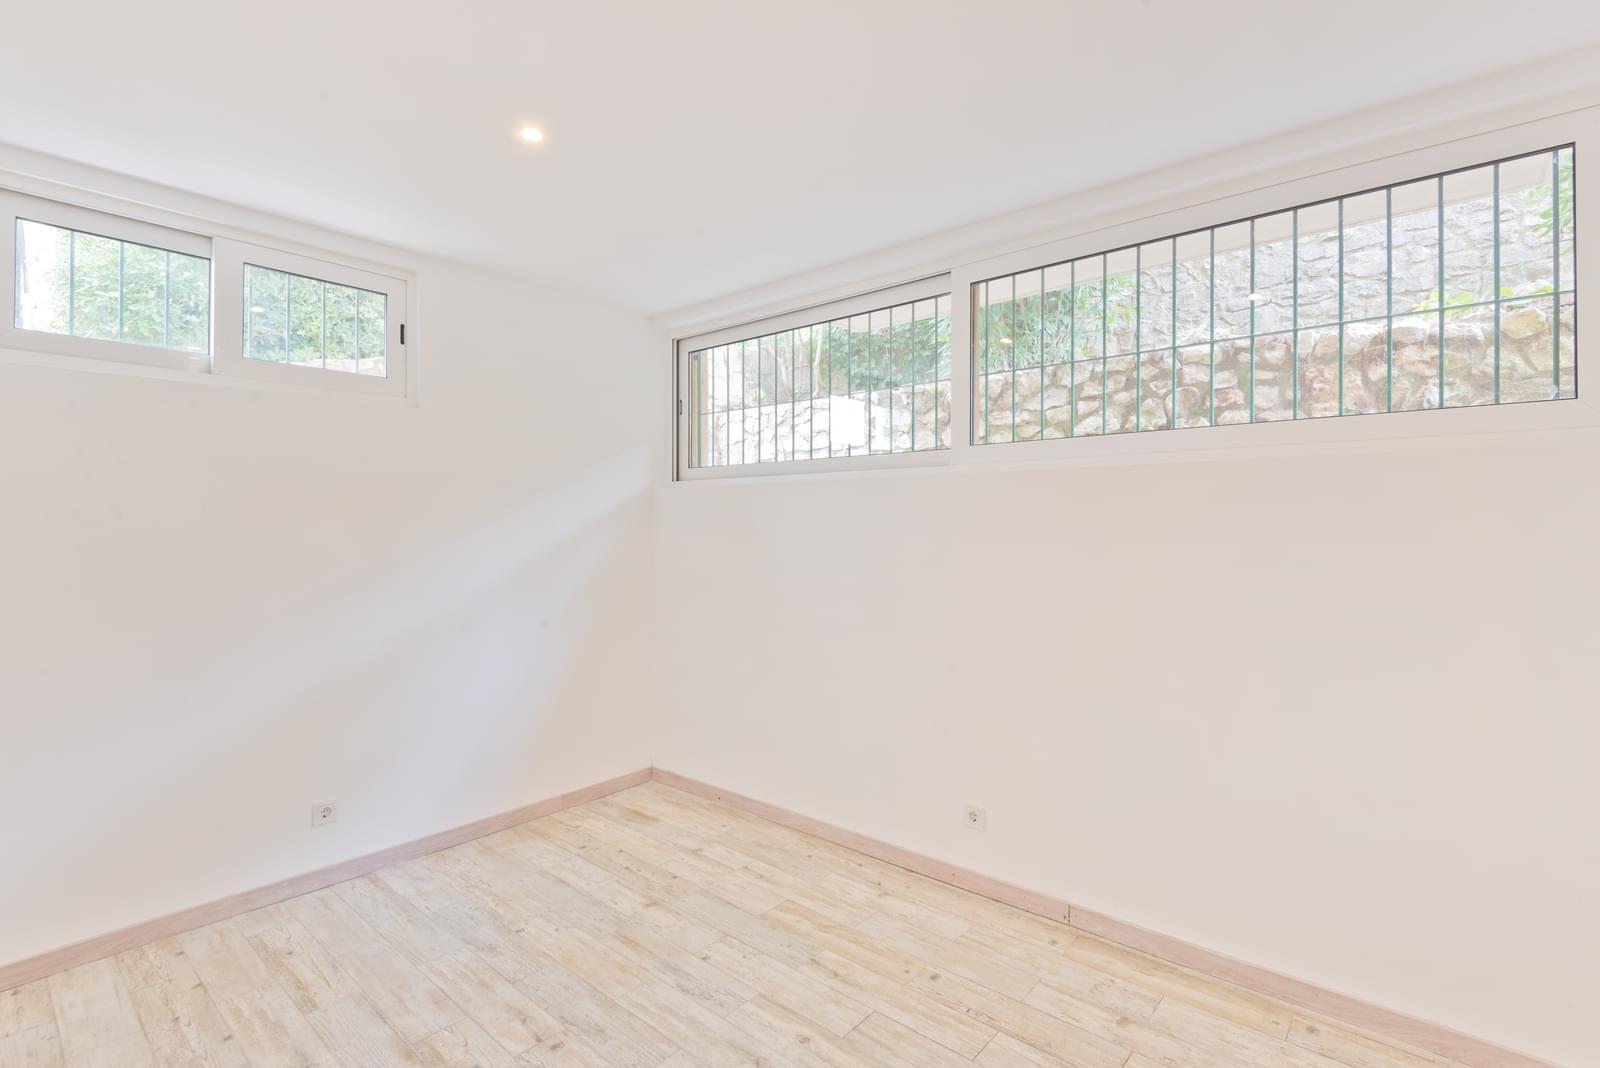 pf17818-apartamento-t1-cascais-d35c86dd-4f60-4c83-8d90-ed2186622195